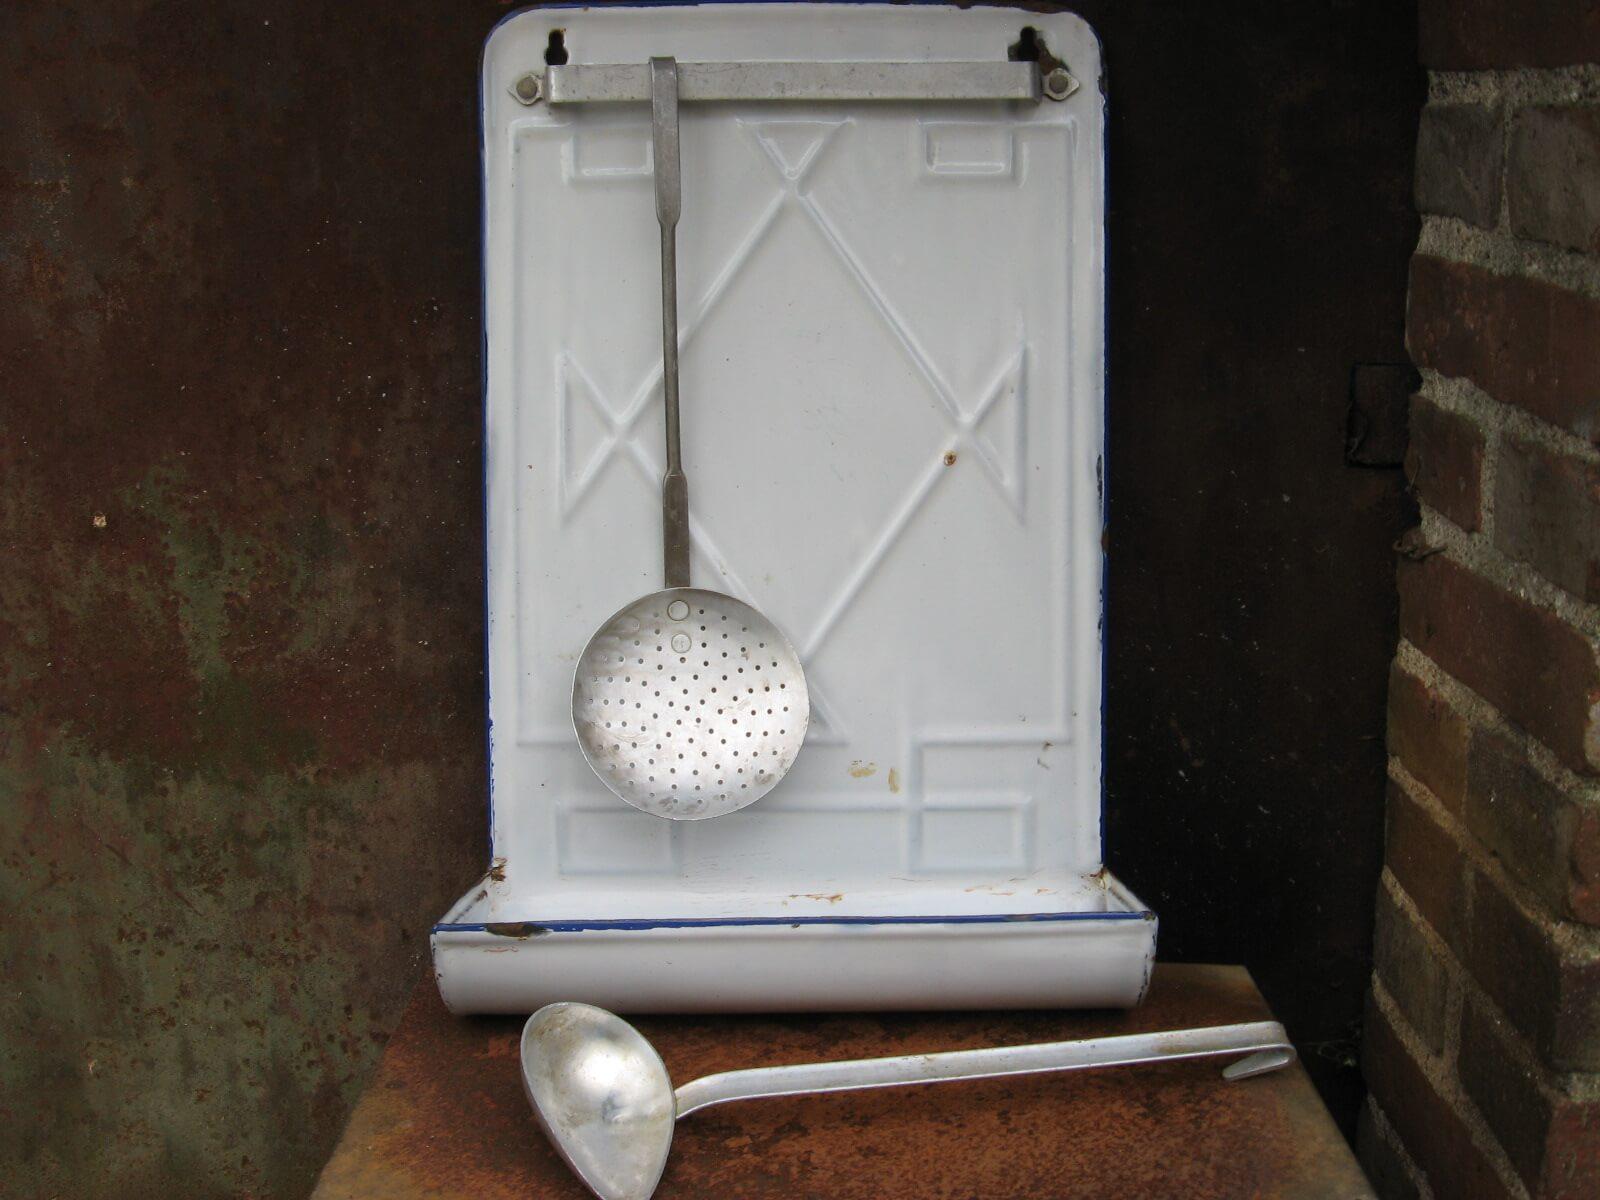 French white enamel utensil drainer at PumpjackPiddlewick